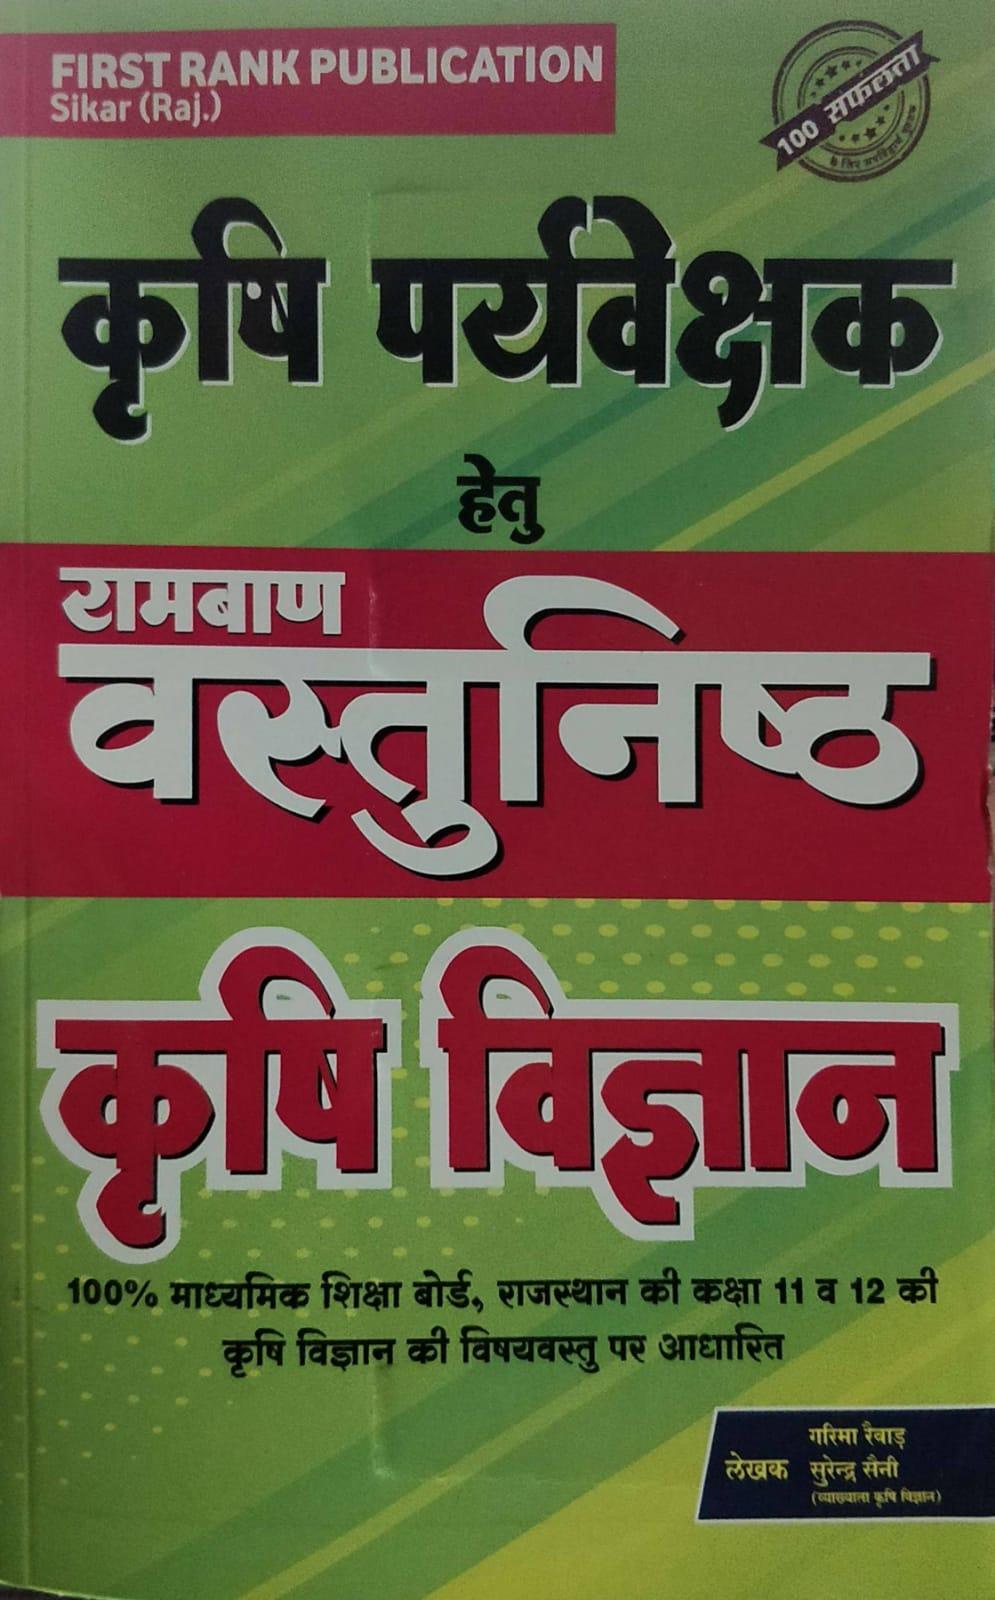 First Rank Krishi Prayvekshak Ramban Vastunisth Krishi Vigyan